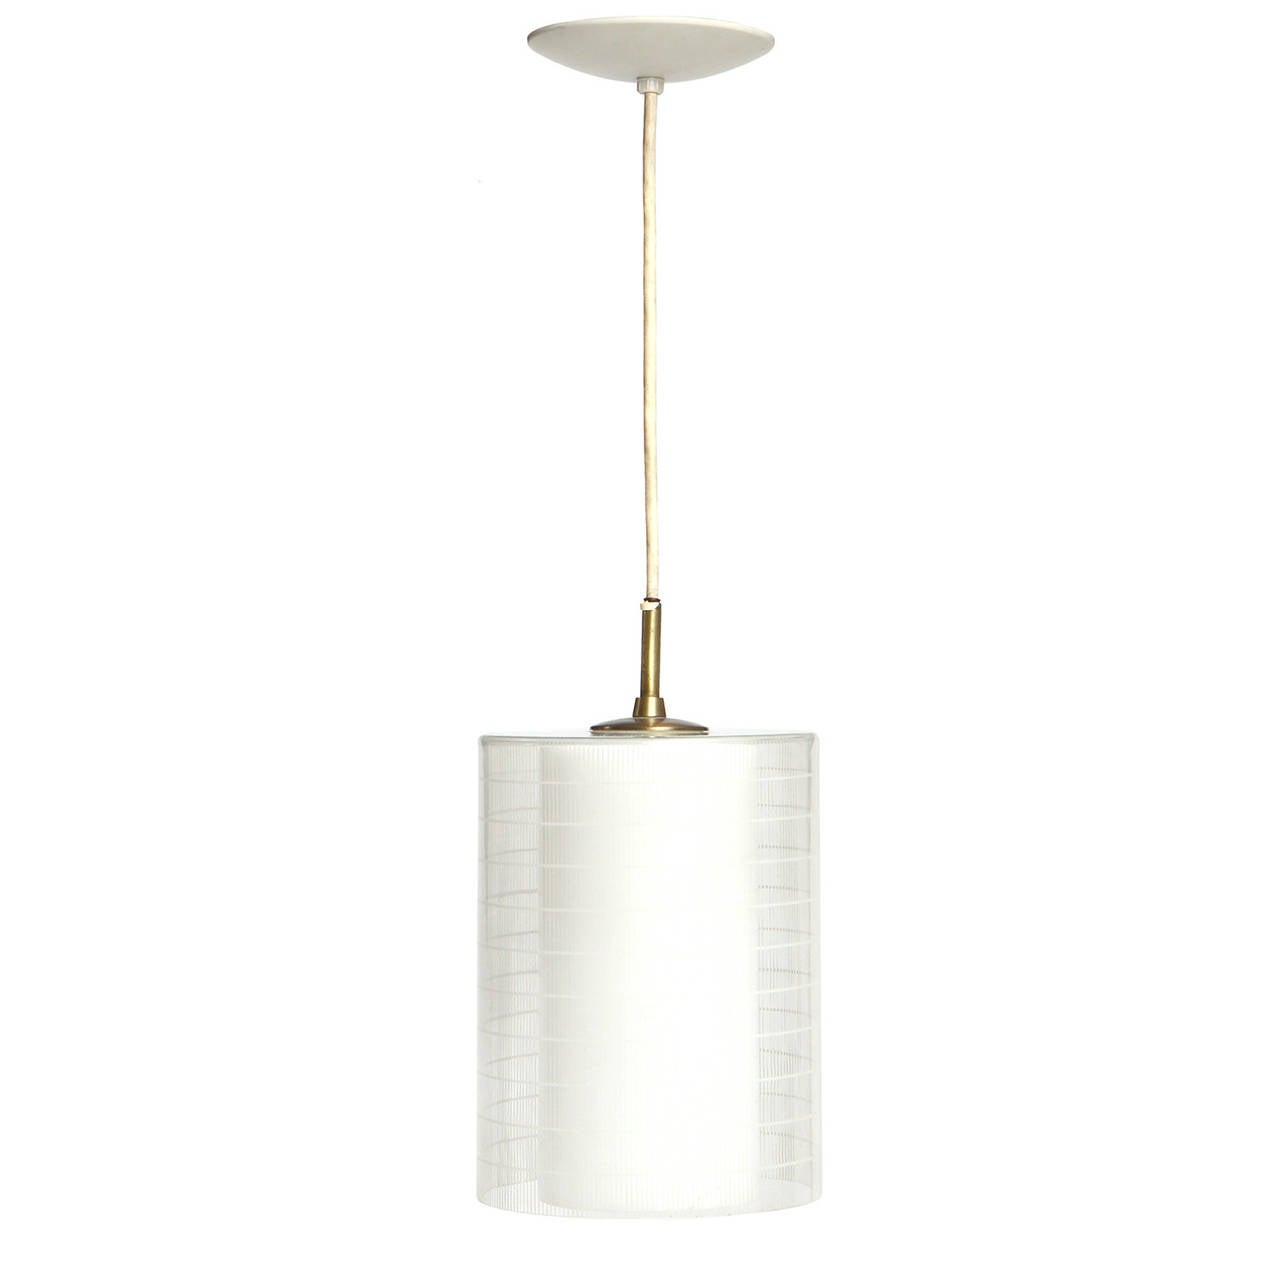 Cylindrical Glass Pendant Lamp, circa 1950s